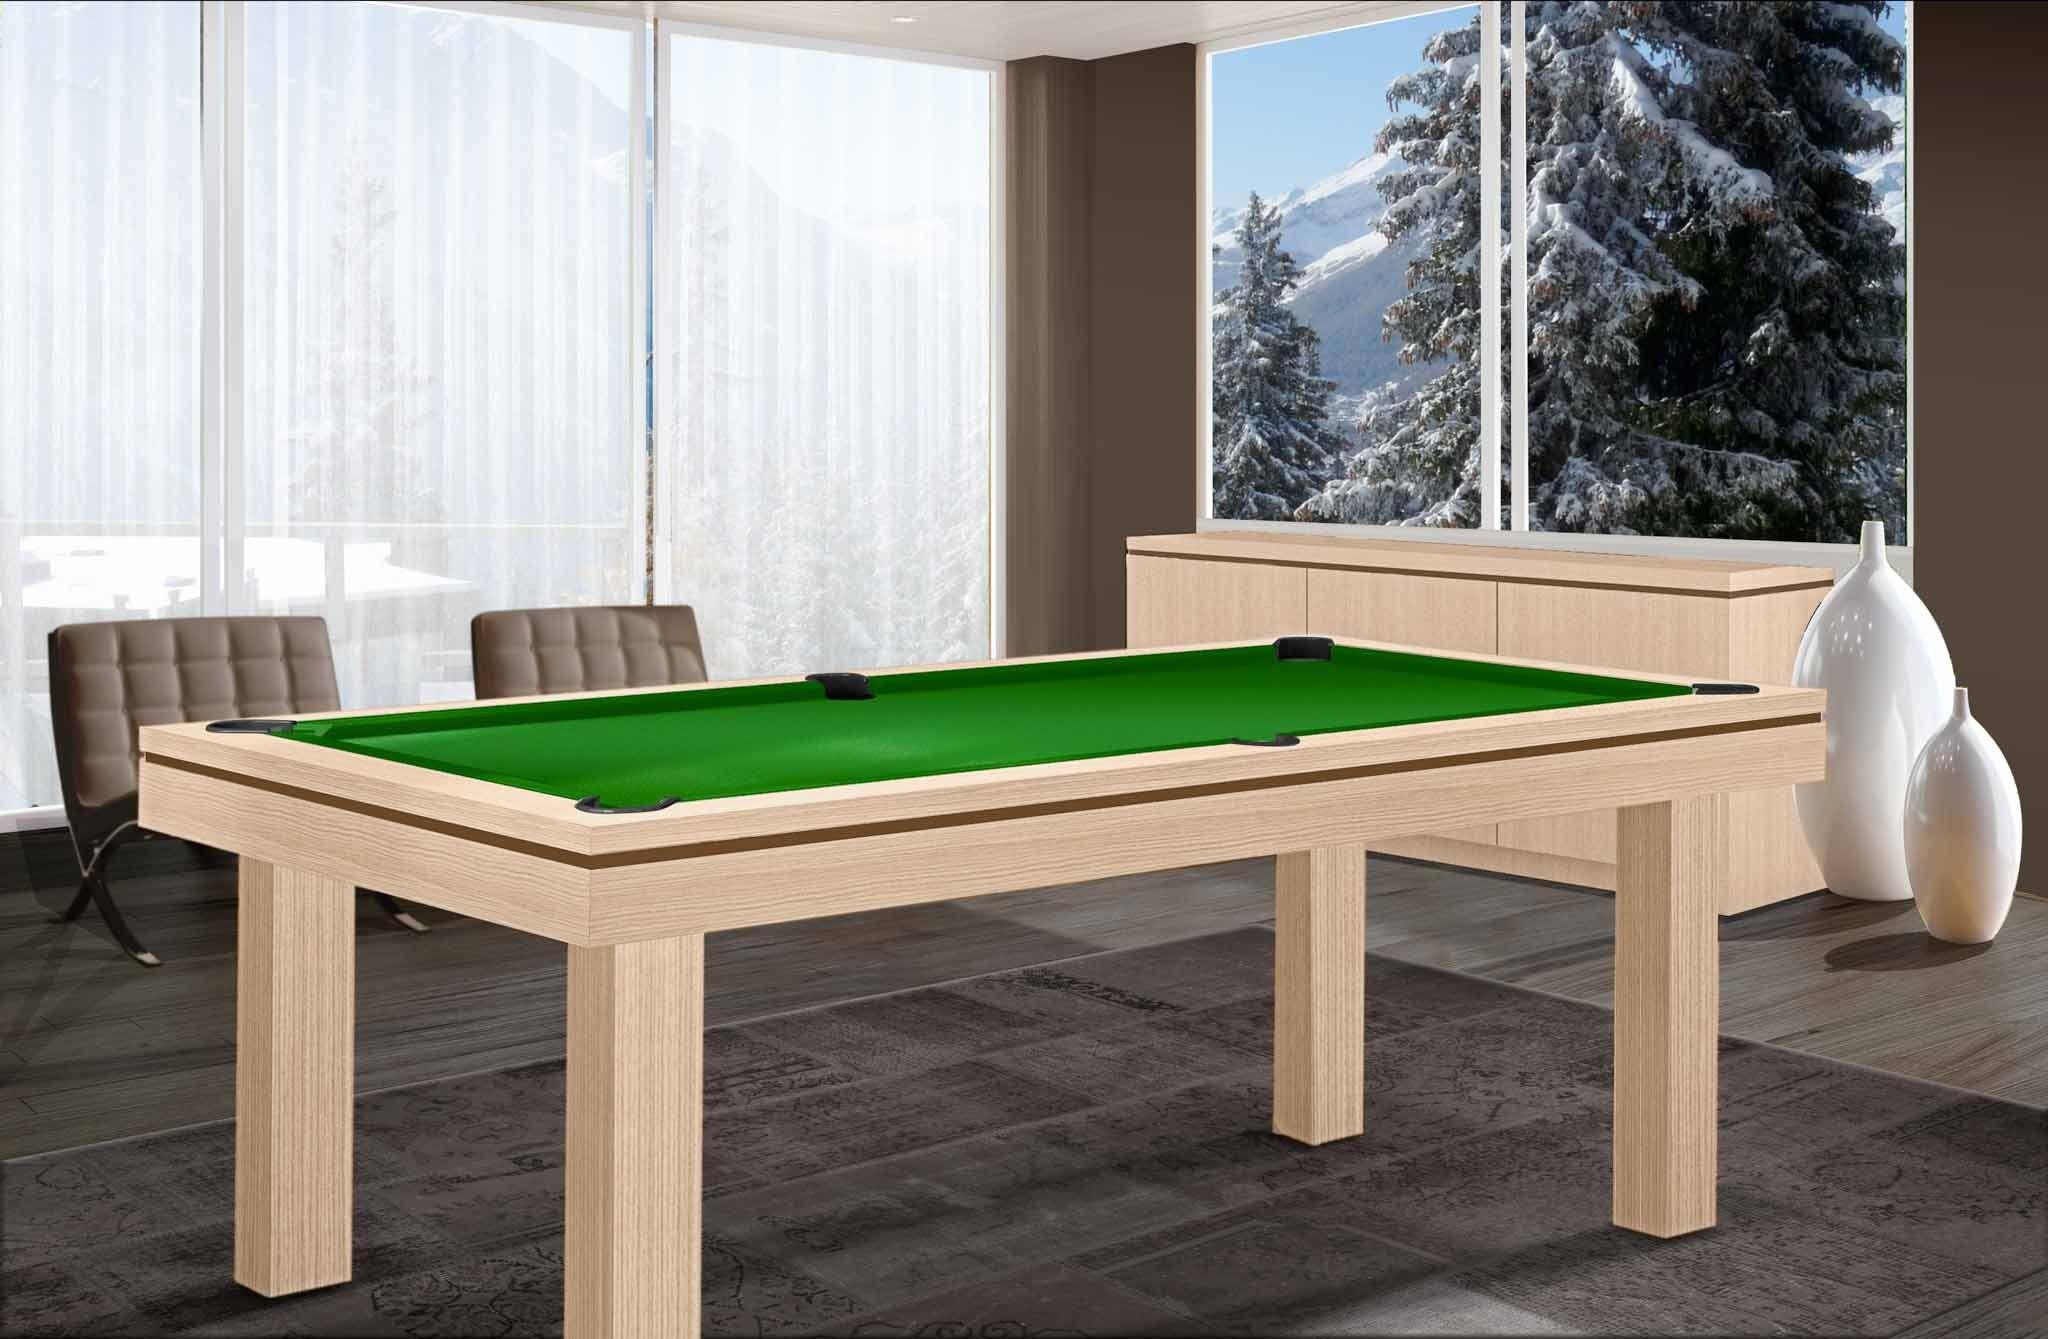 ... Billard Moderne LIVEA, Finition Chêne Alpin Blanc Avec Liseré Gris  Ardoise Et Tissu Vert Pomme